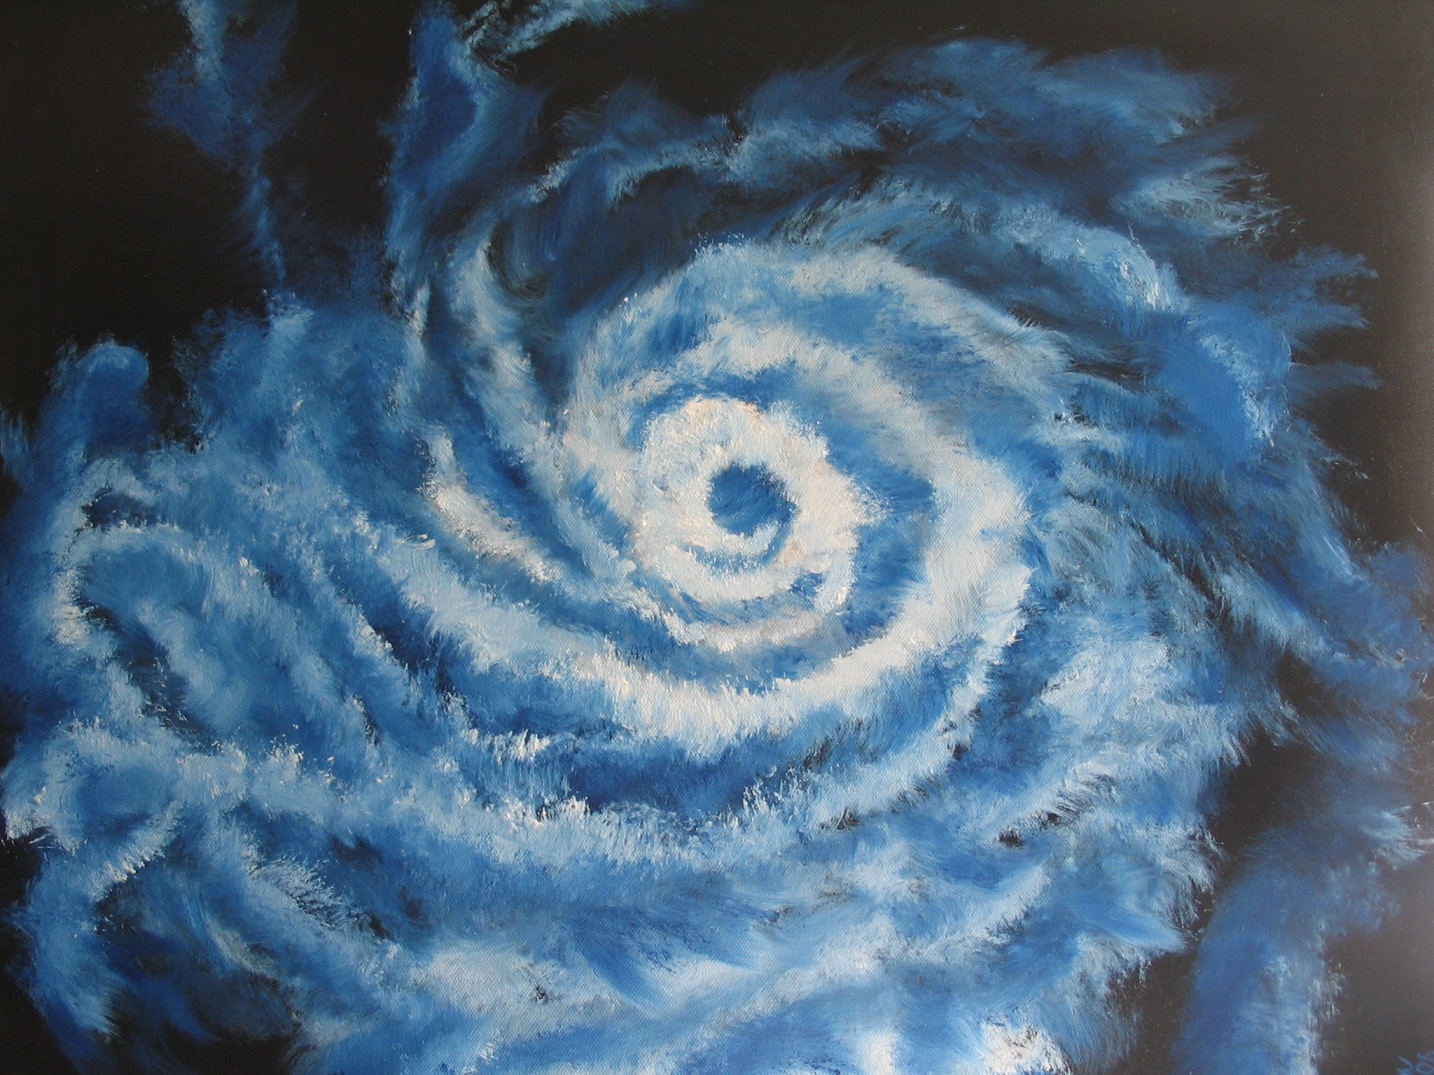 Eye_of_the_Storm3_07.JPG